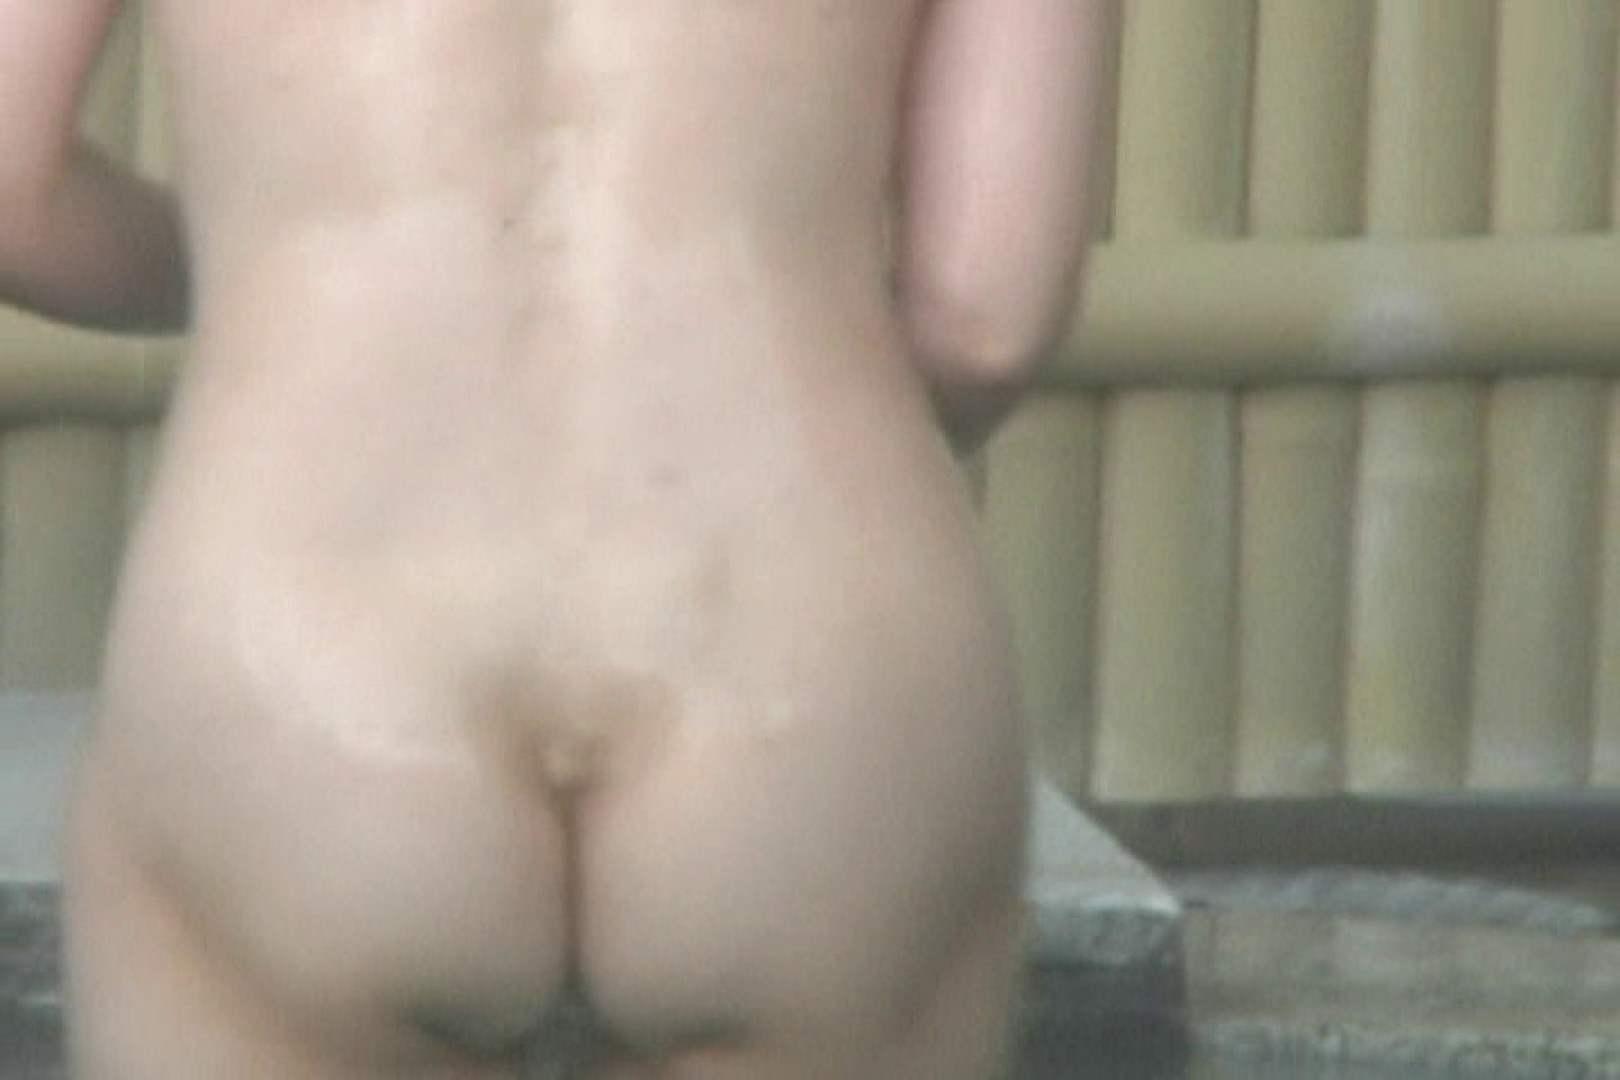 Aquaな露天風呂Vol.592 露天風呂突入 盗撮動画紹介 91pic 20